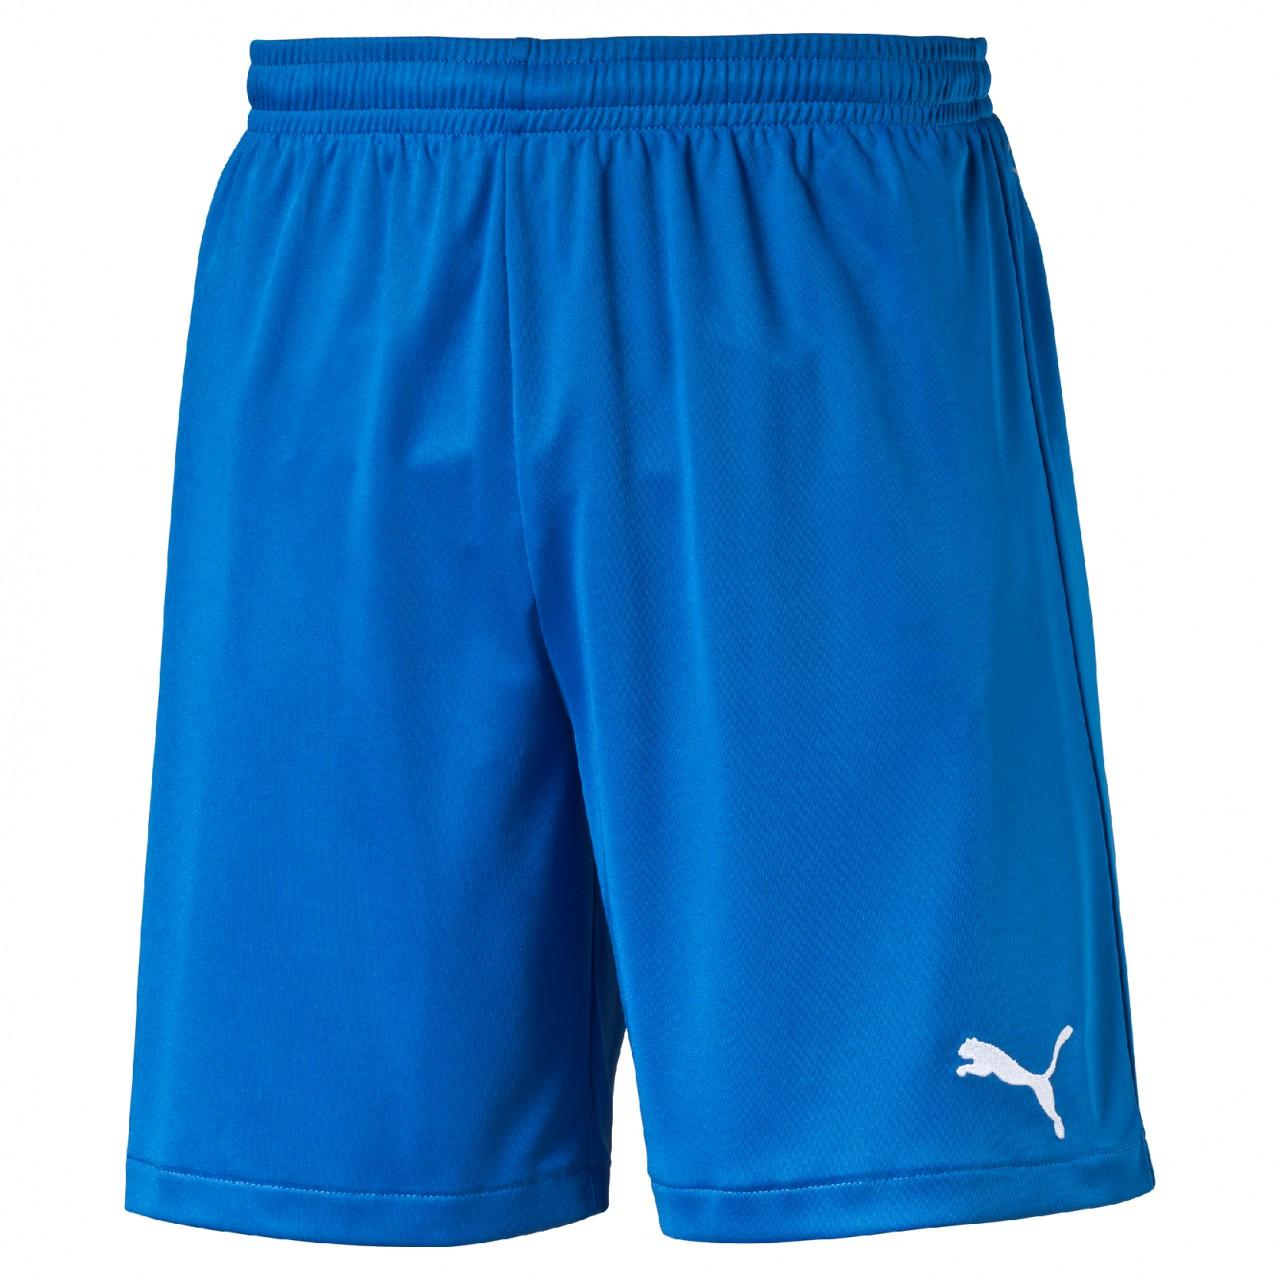 PUMA Velize Shorts w. innerslip